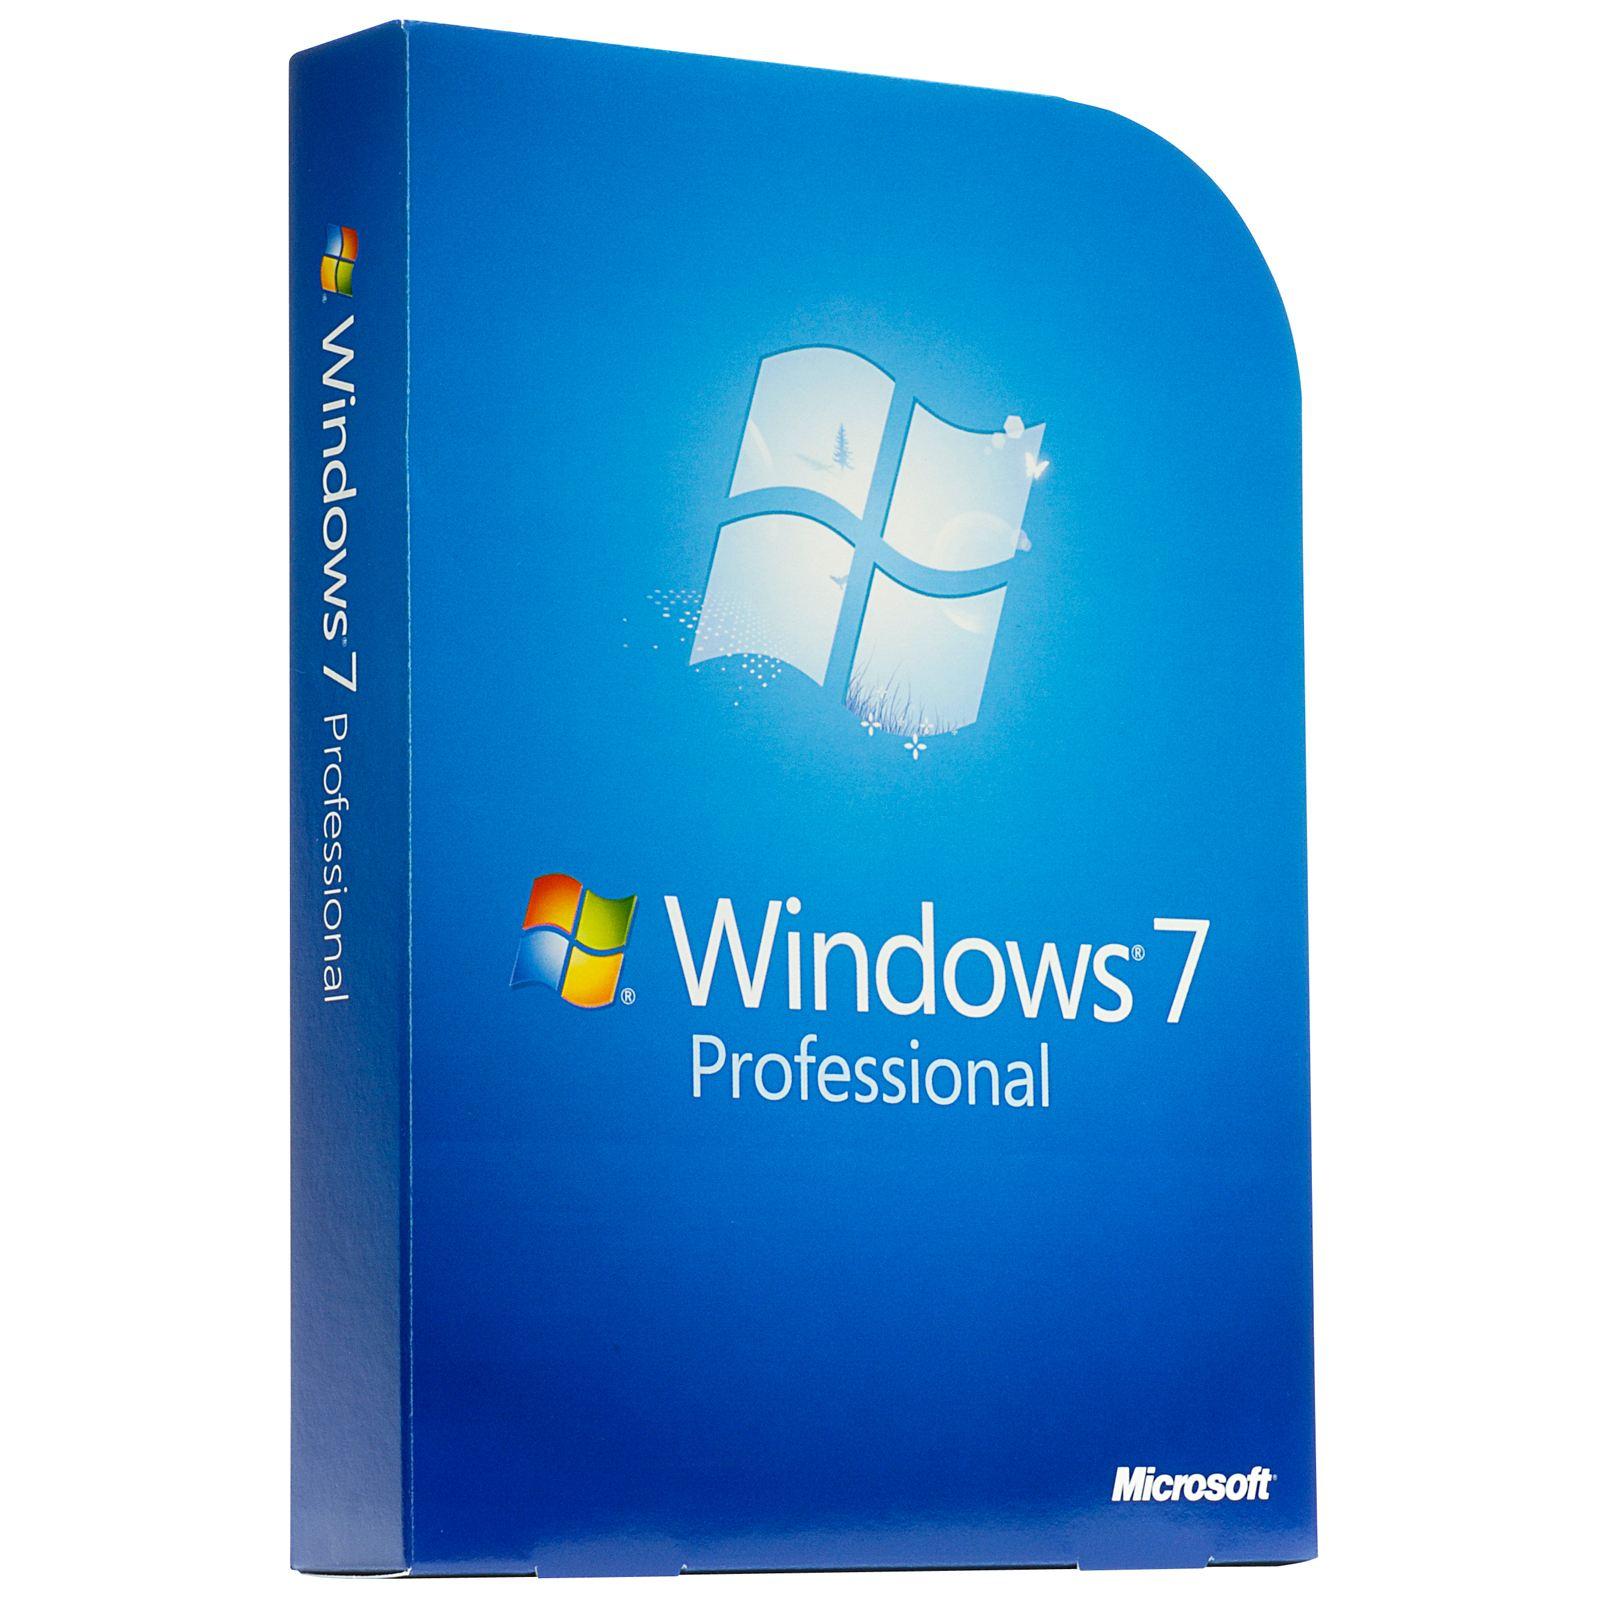 WINDOWS 7 PRO. 32/64 BITS + ATIVADOR